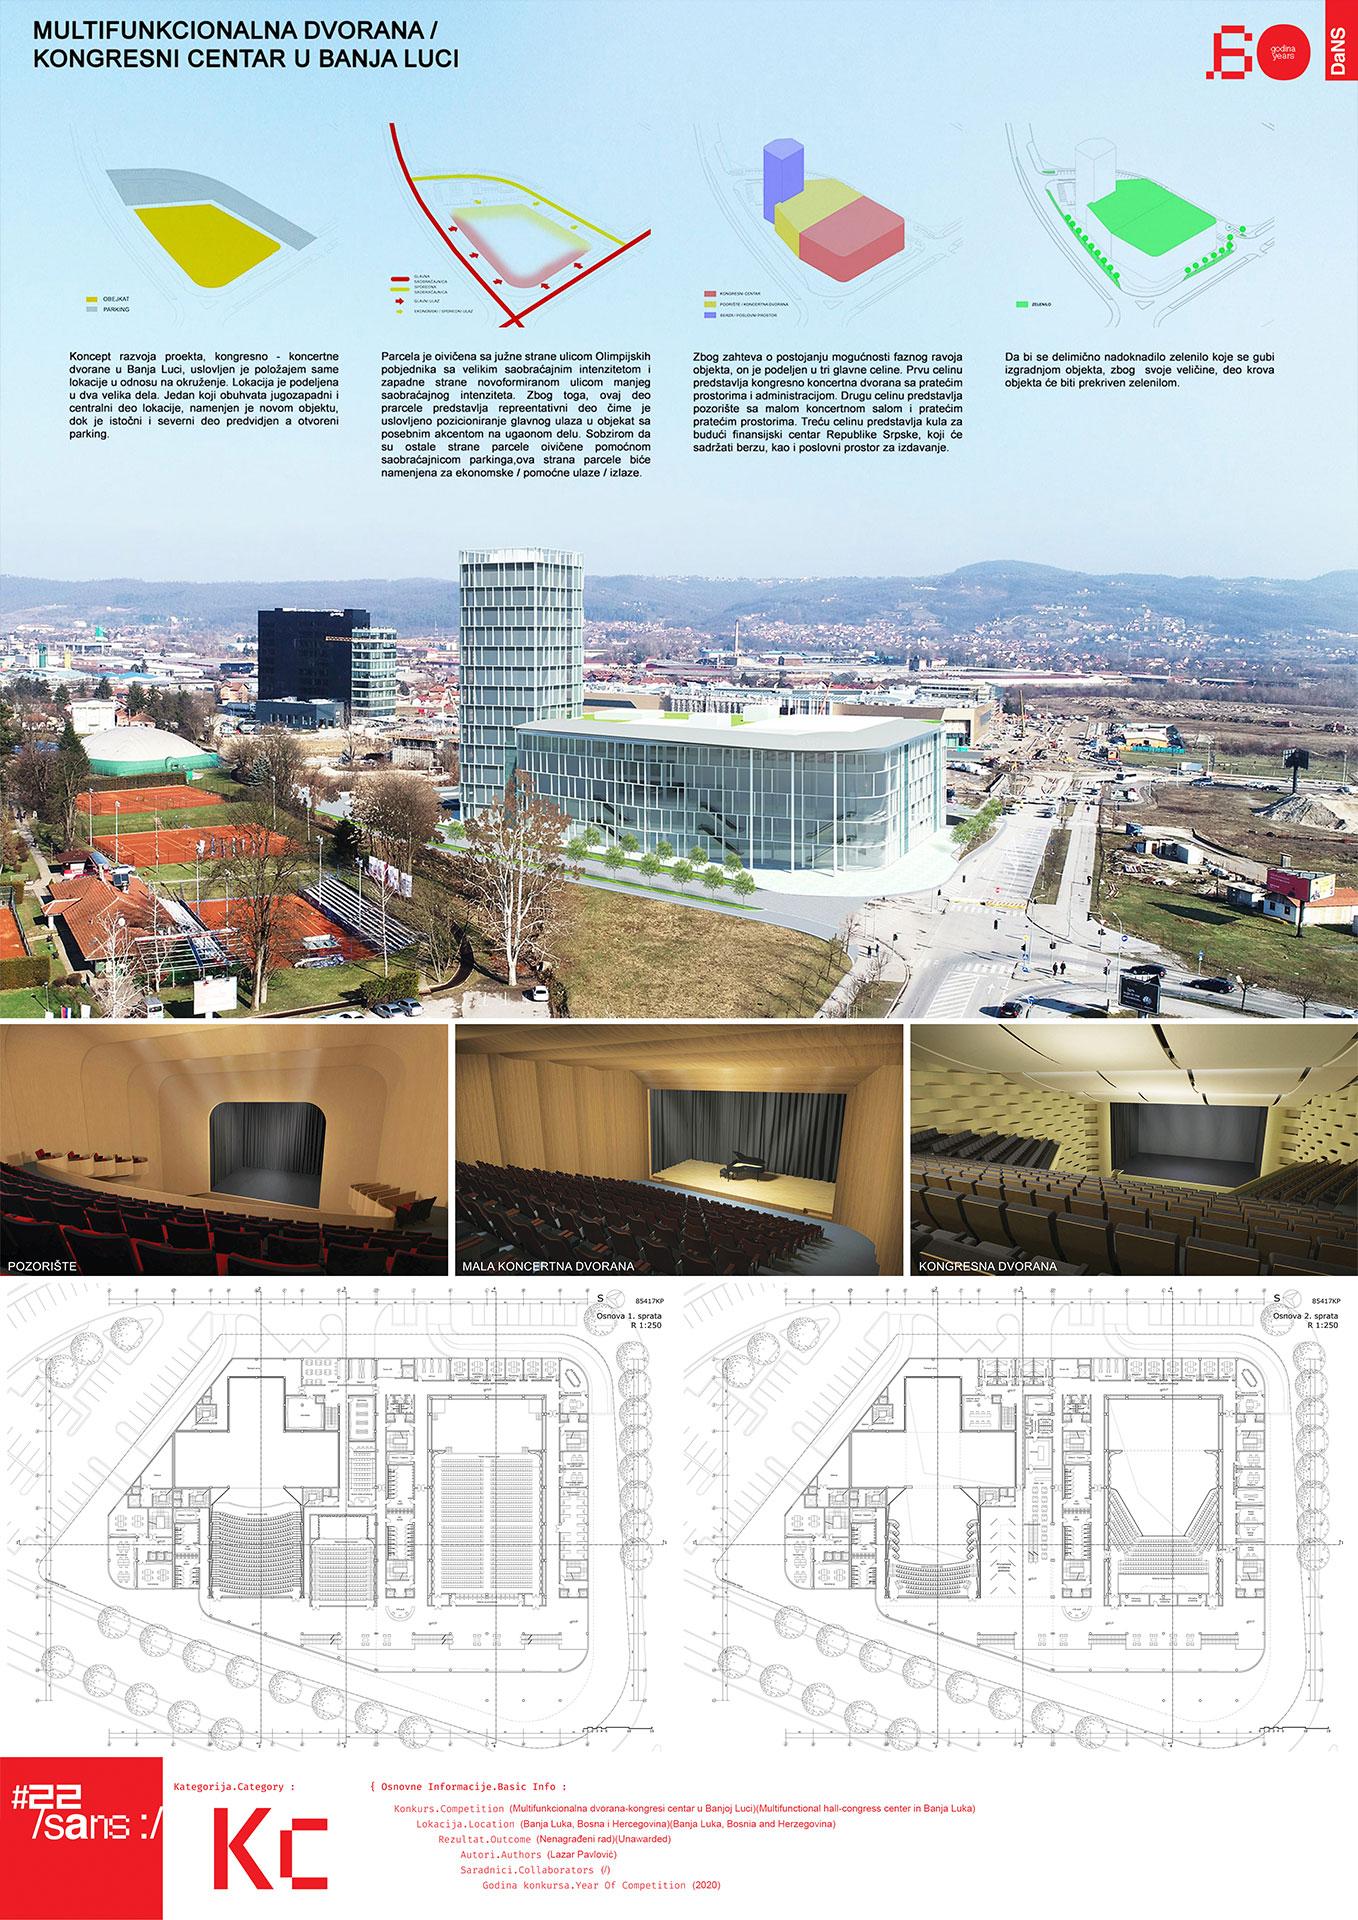 "<p class=""naslov-br"">kc04</p>Multifunkcionalna dvorana / kongresni centar u Banjoj Luci // Multifunctional Hall / Congress Center in Banja Luka"